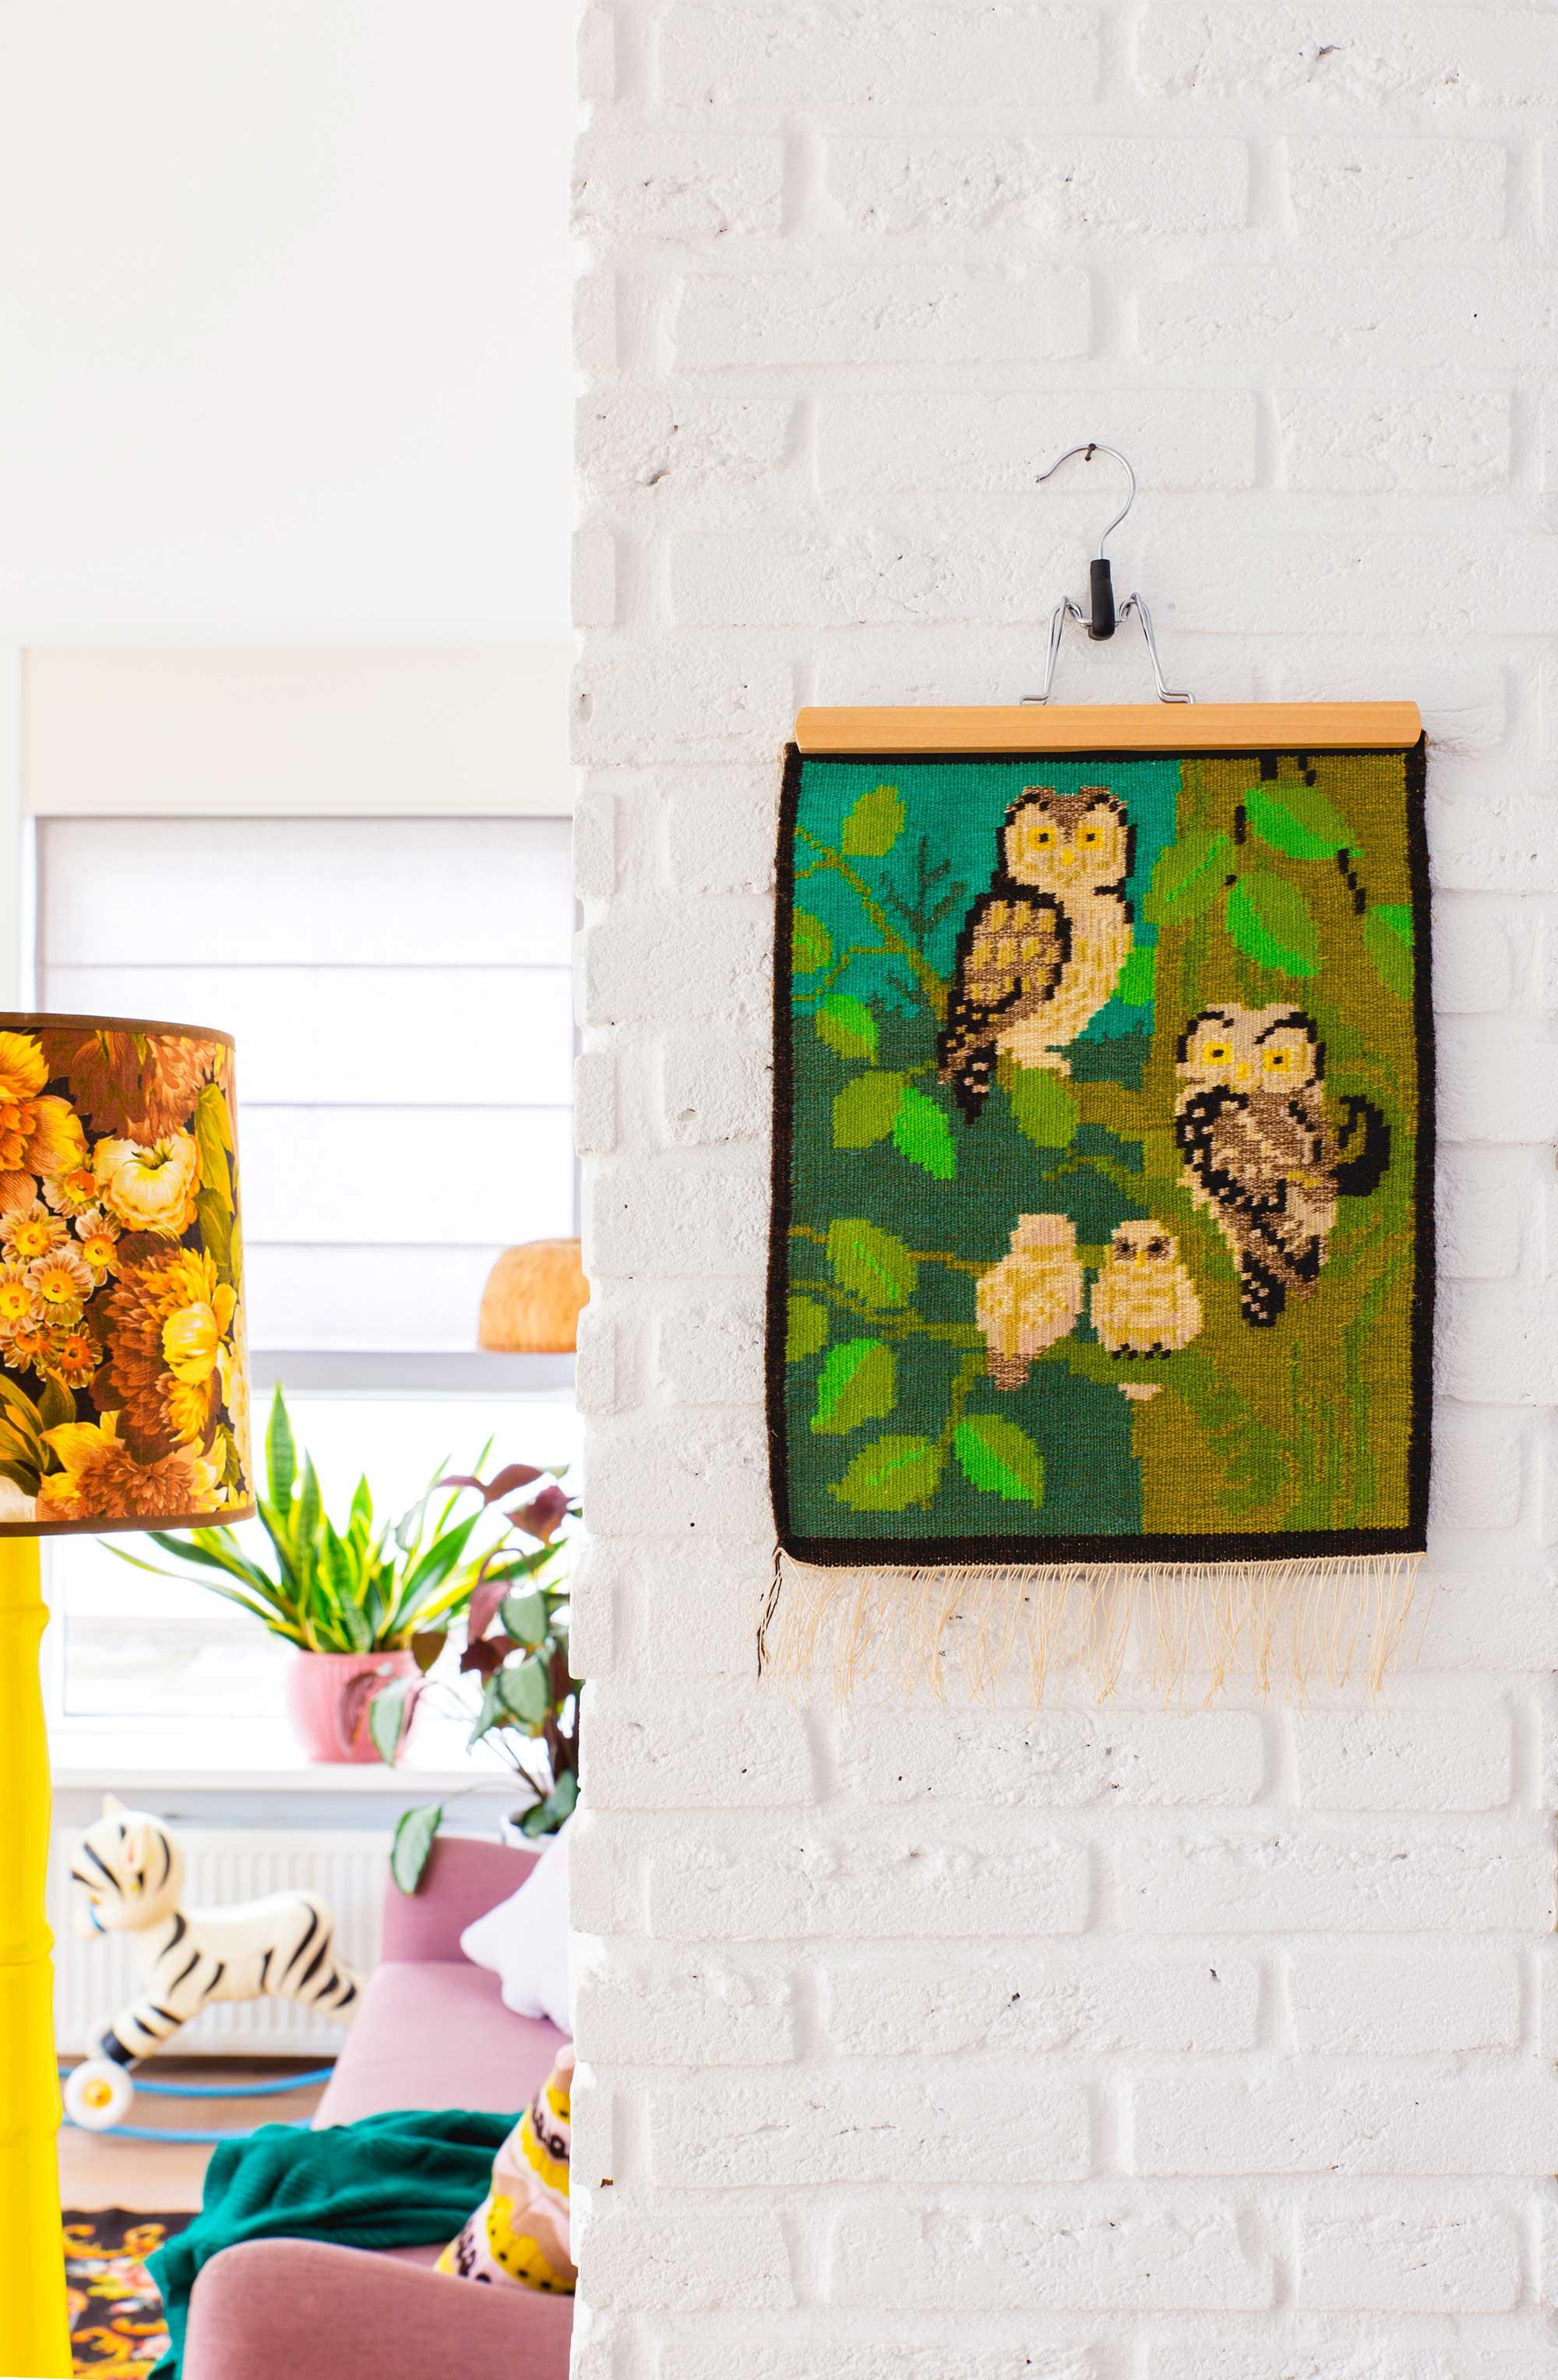 Vintage wandkleed met uilen in de woonkamer van blogger Oh Marie!